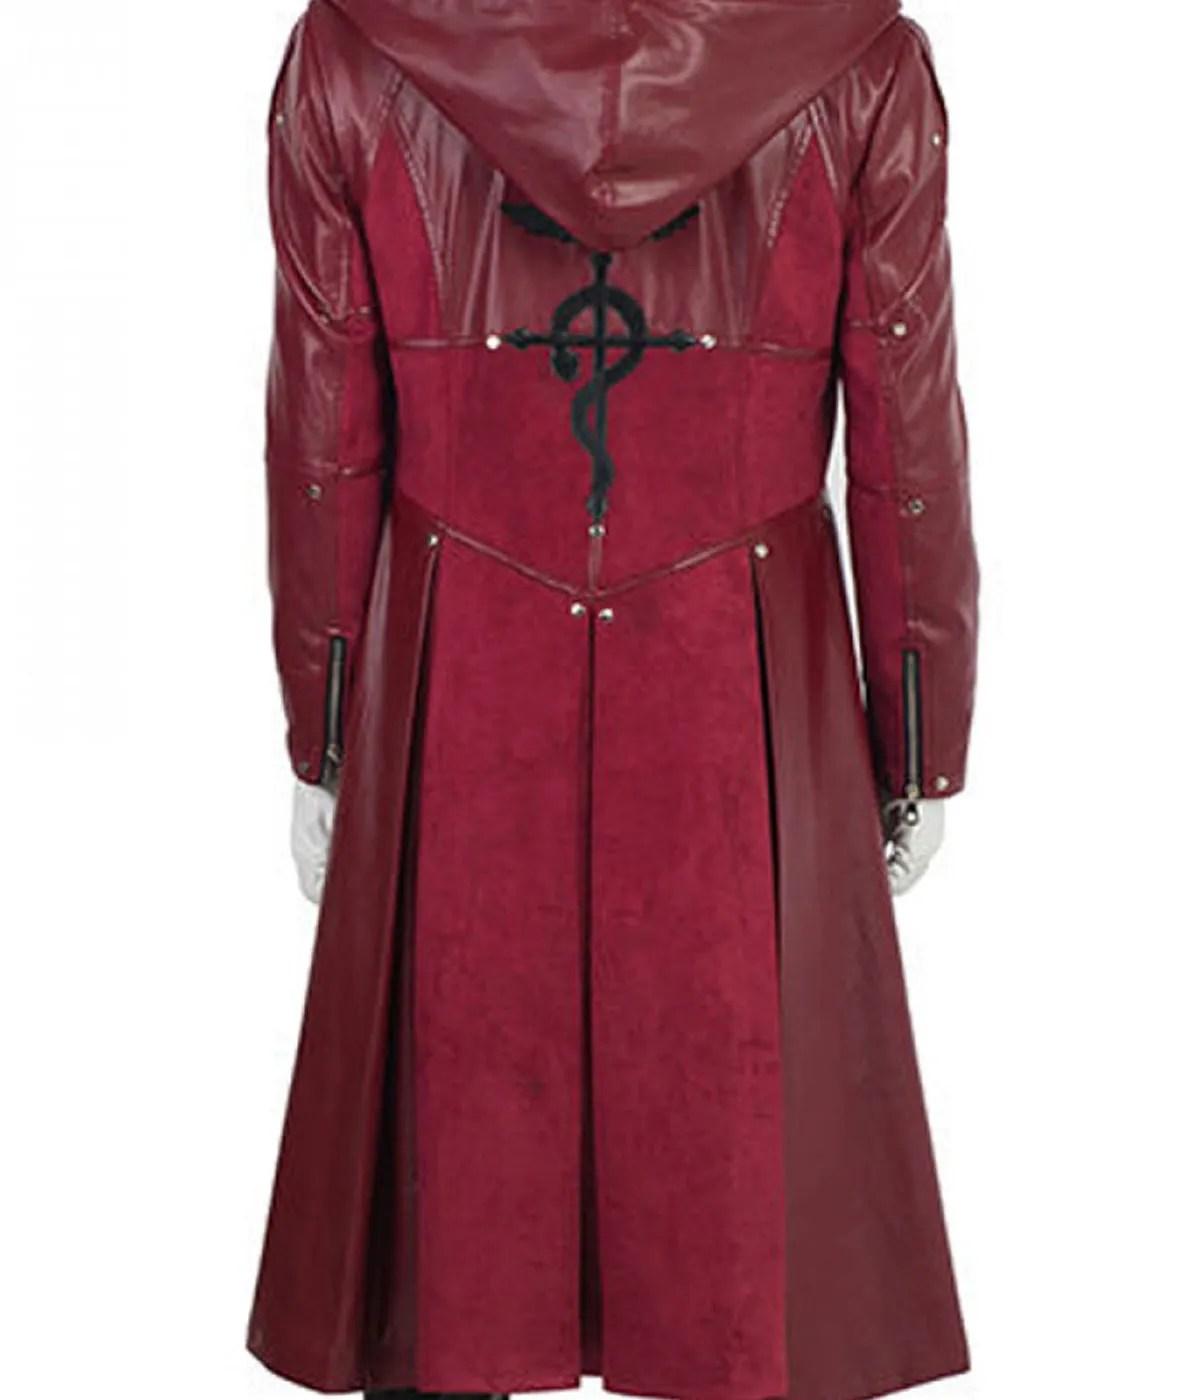 fullmetal-alchemist-edward-elric-red-leather-coat